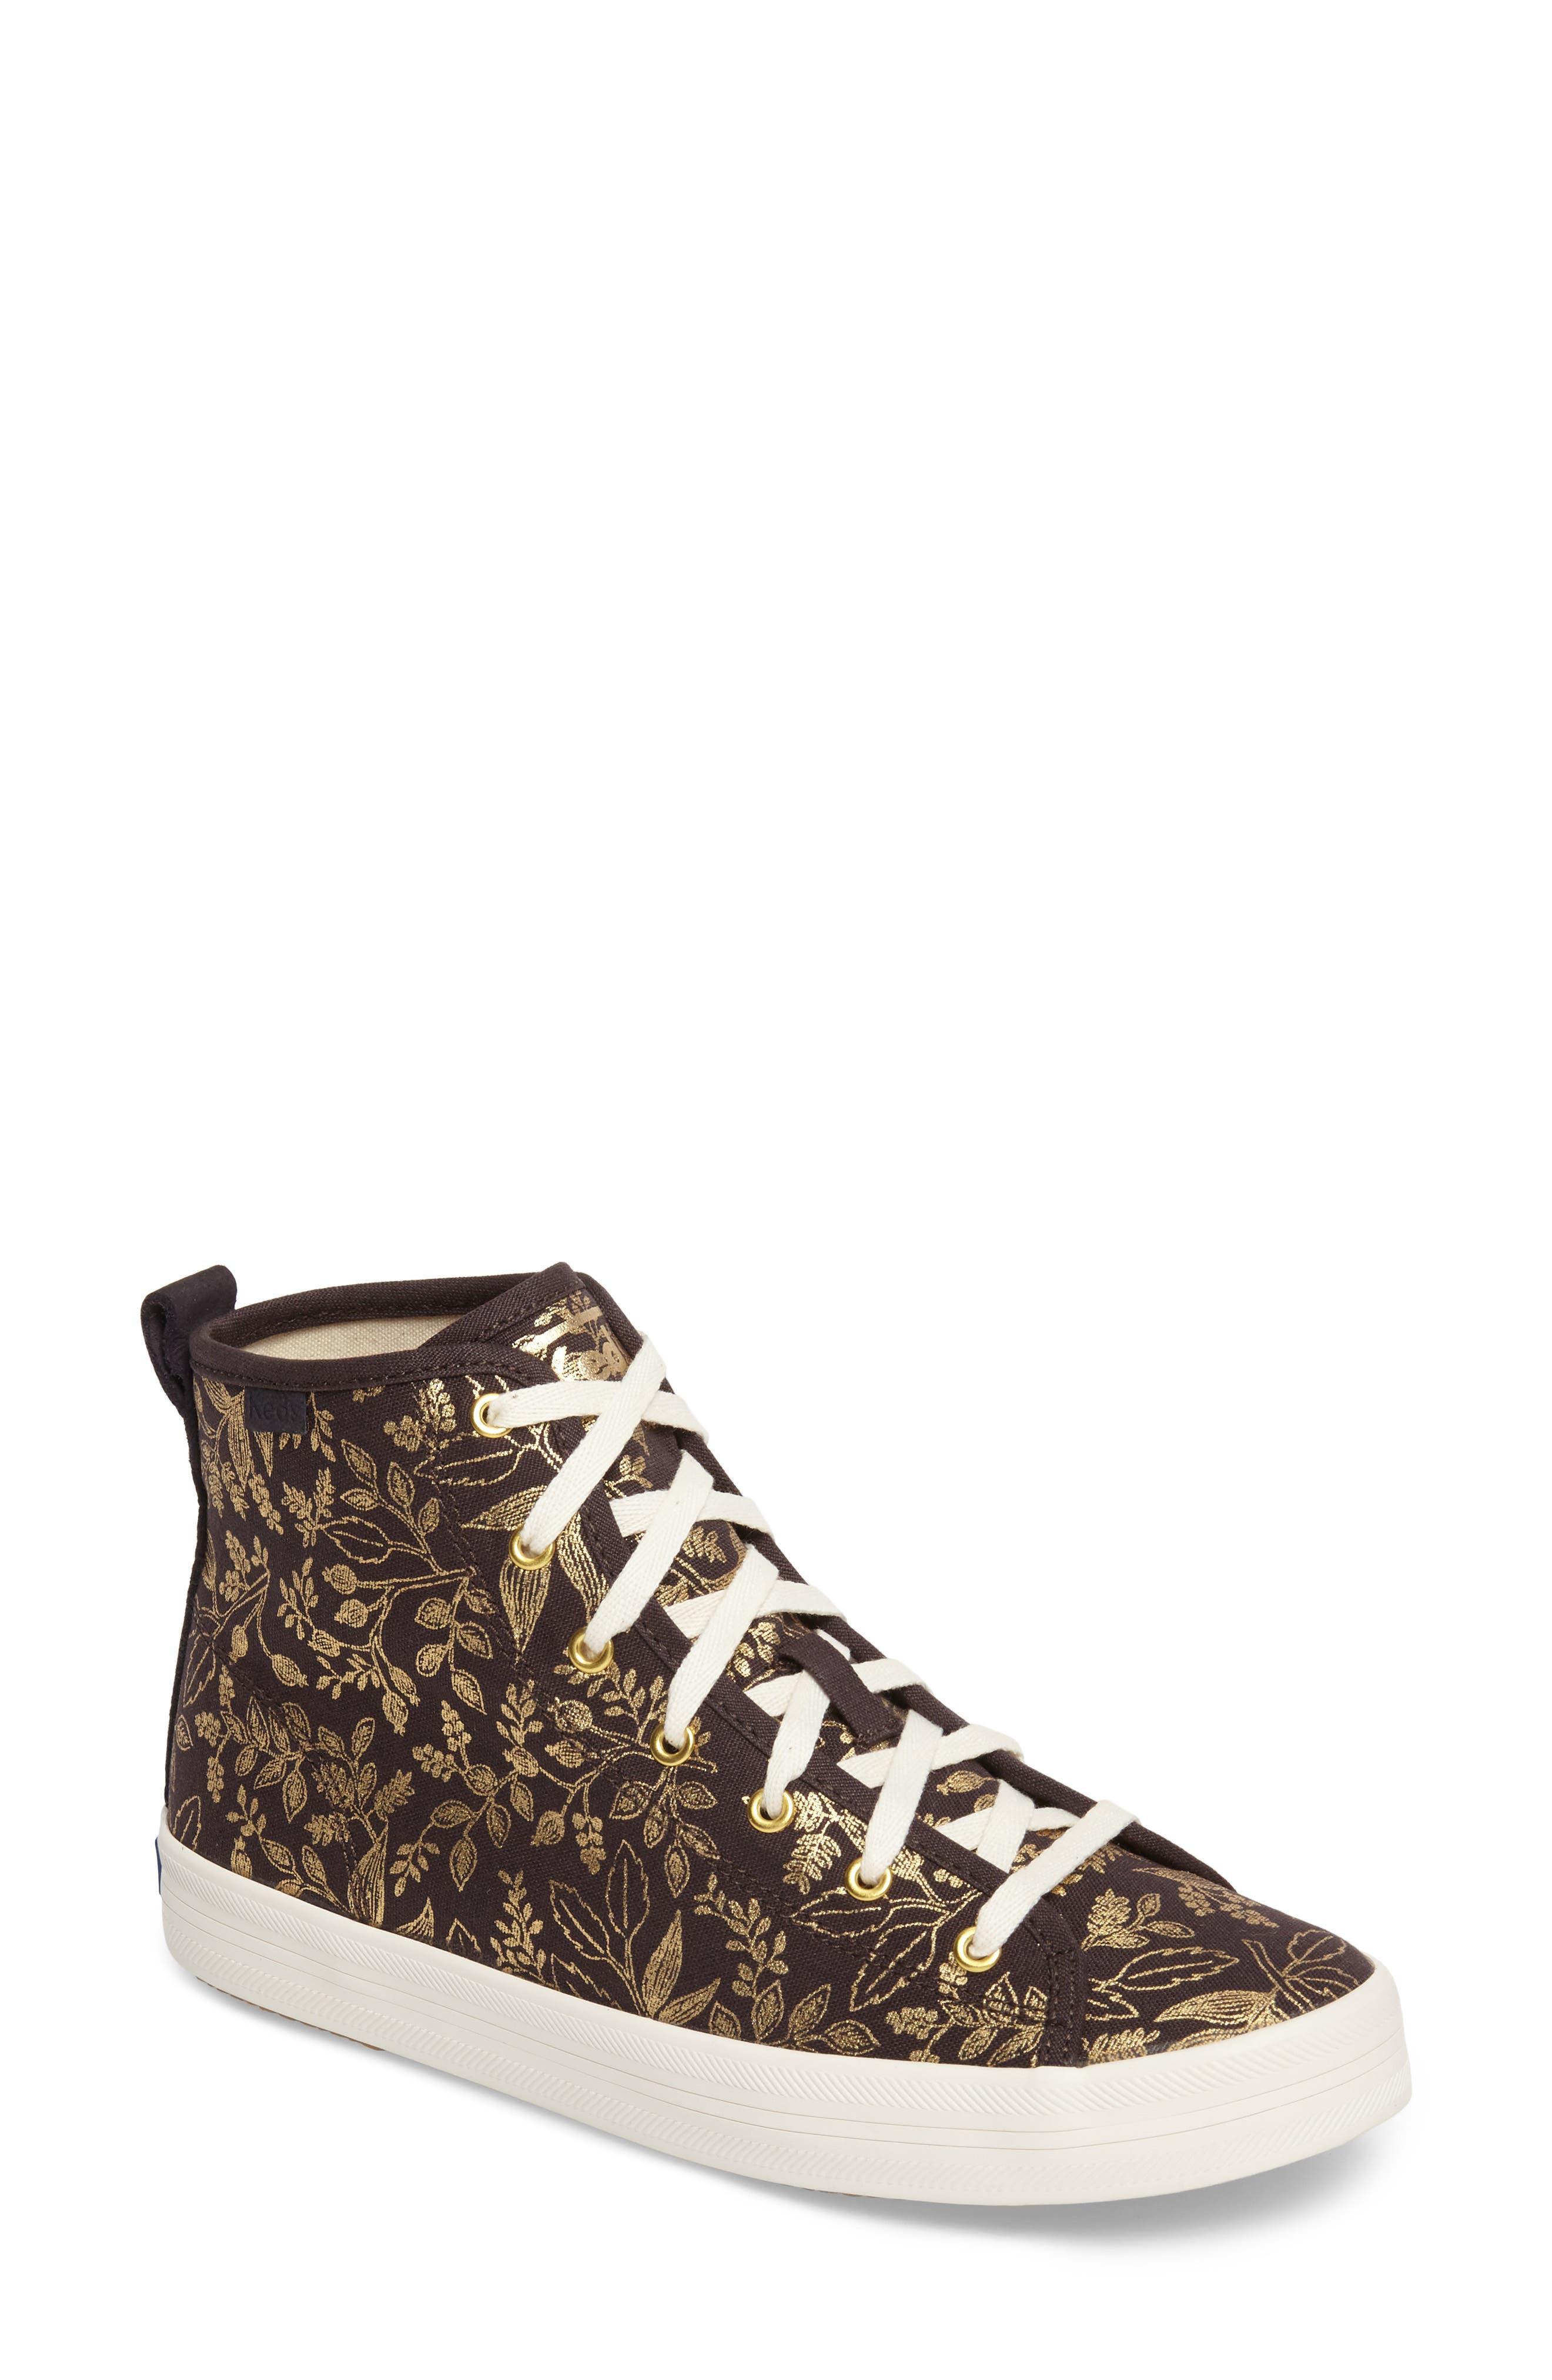 Main Image - Keds® x Rifle Paper Co. Queen Anne High Top Sneaker (Women)